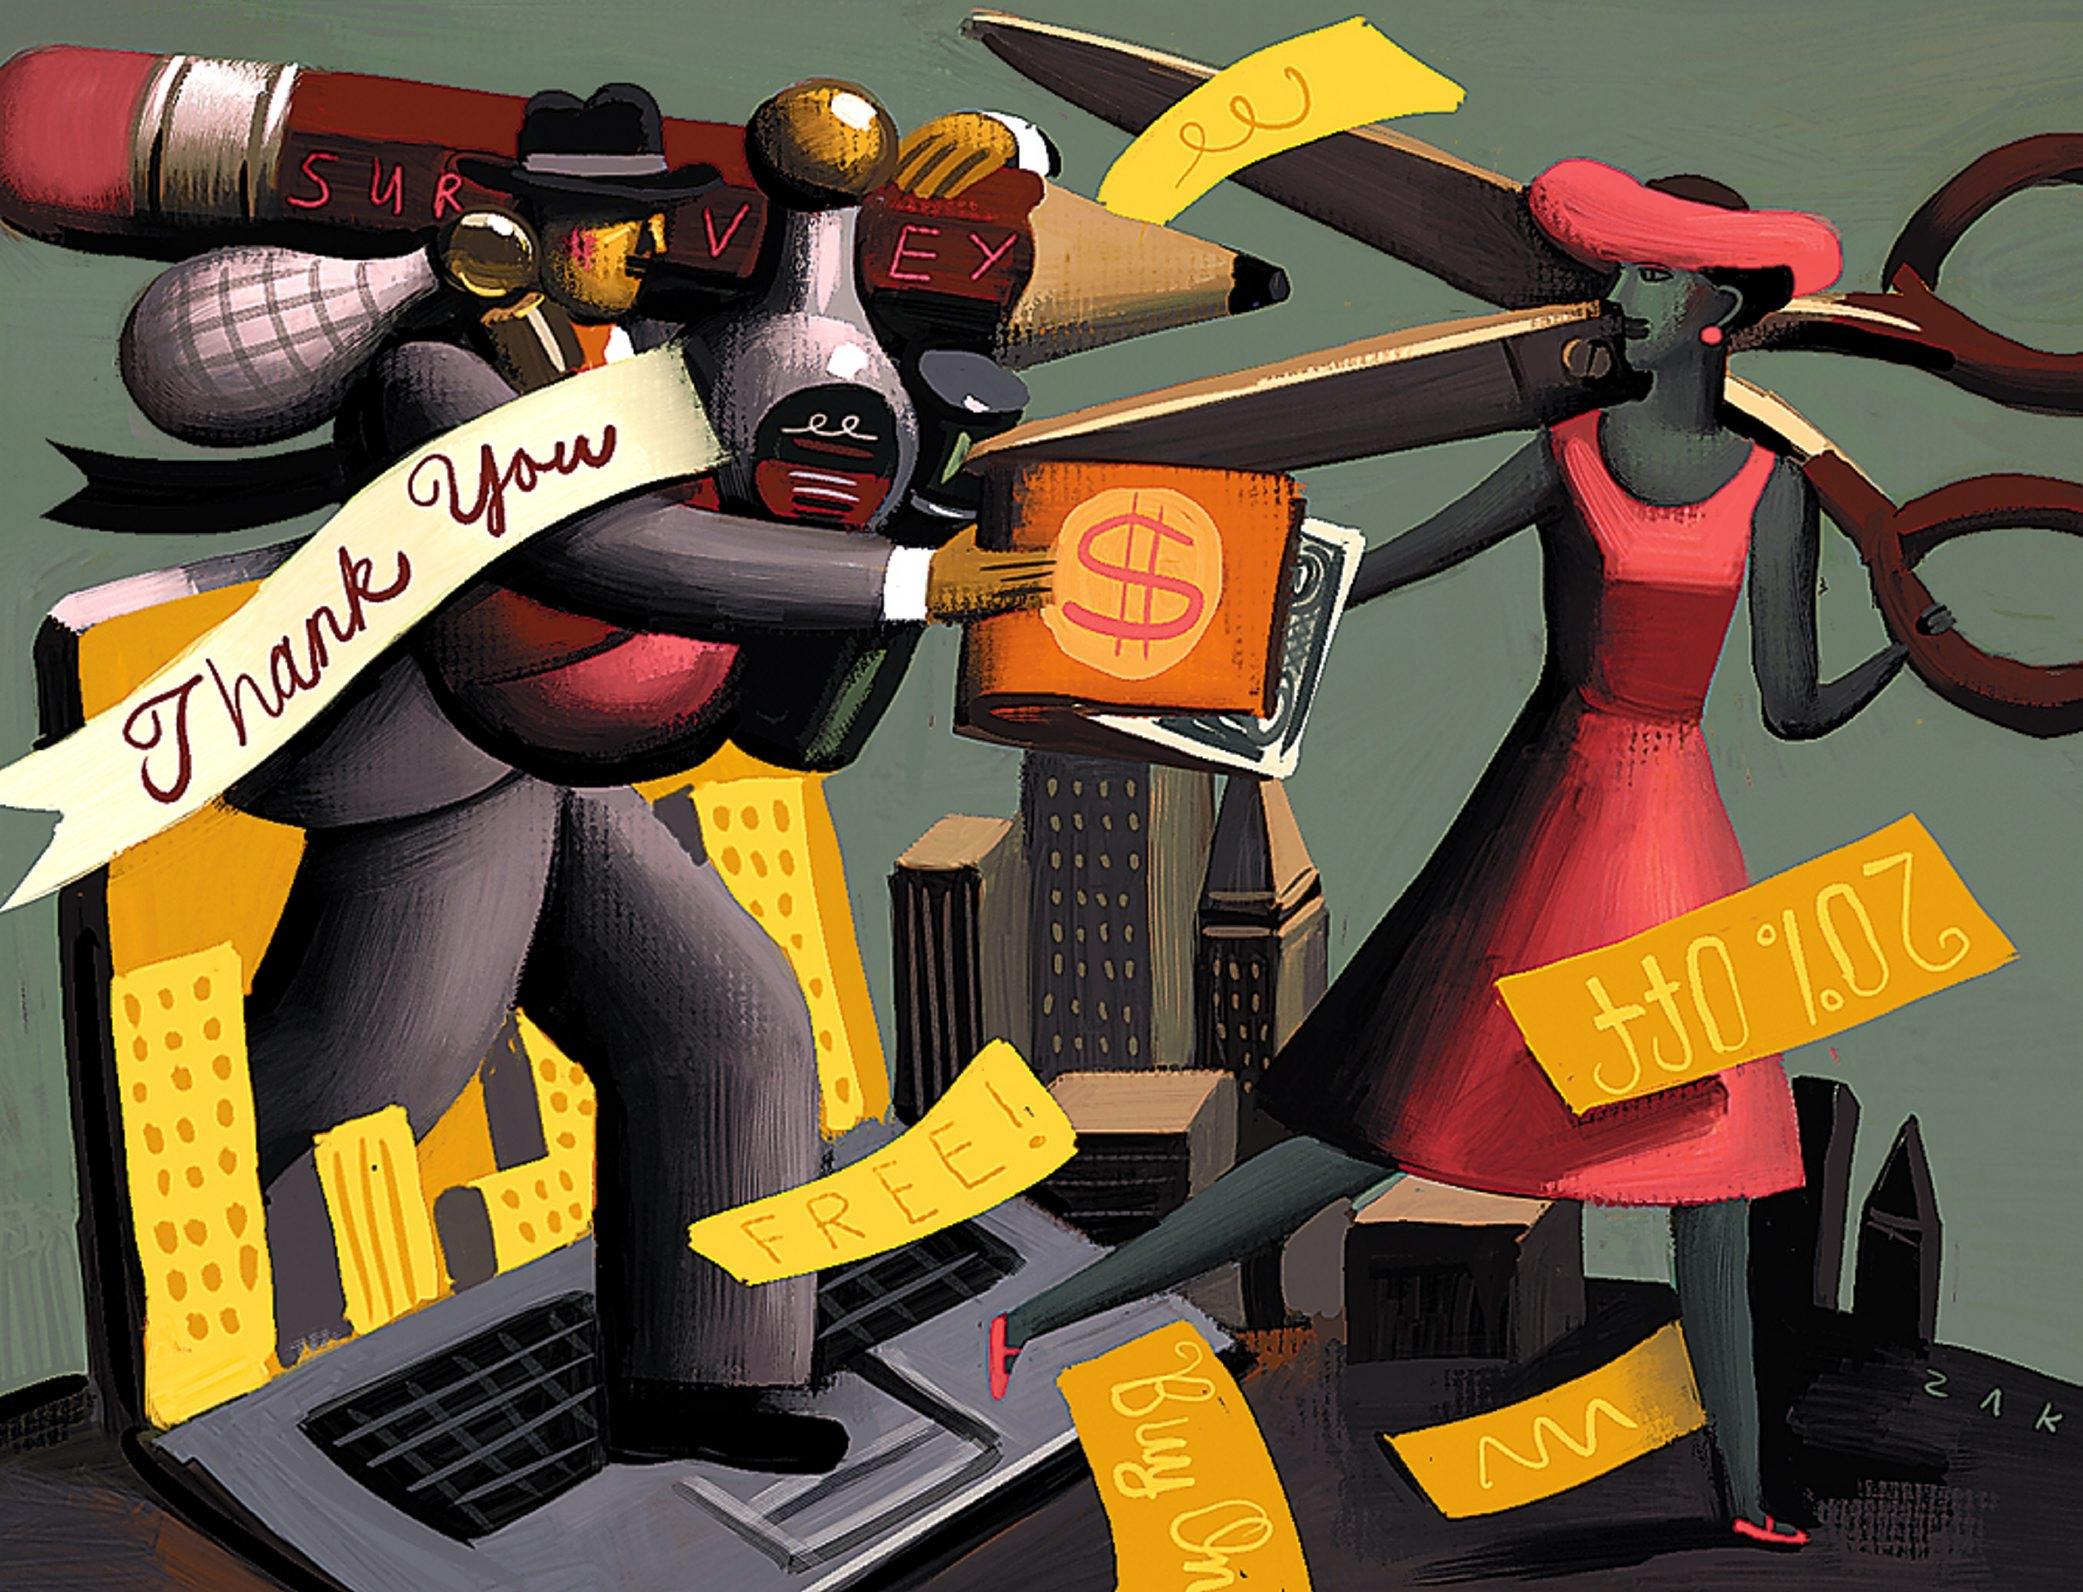 MoneySmart illustration by Daniel Zakroczemski.